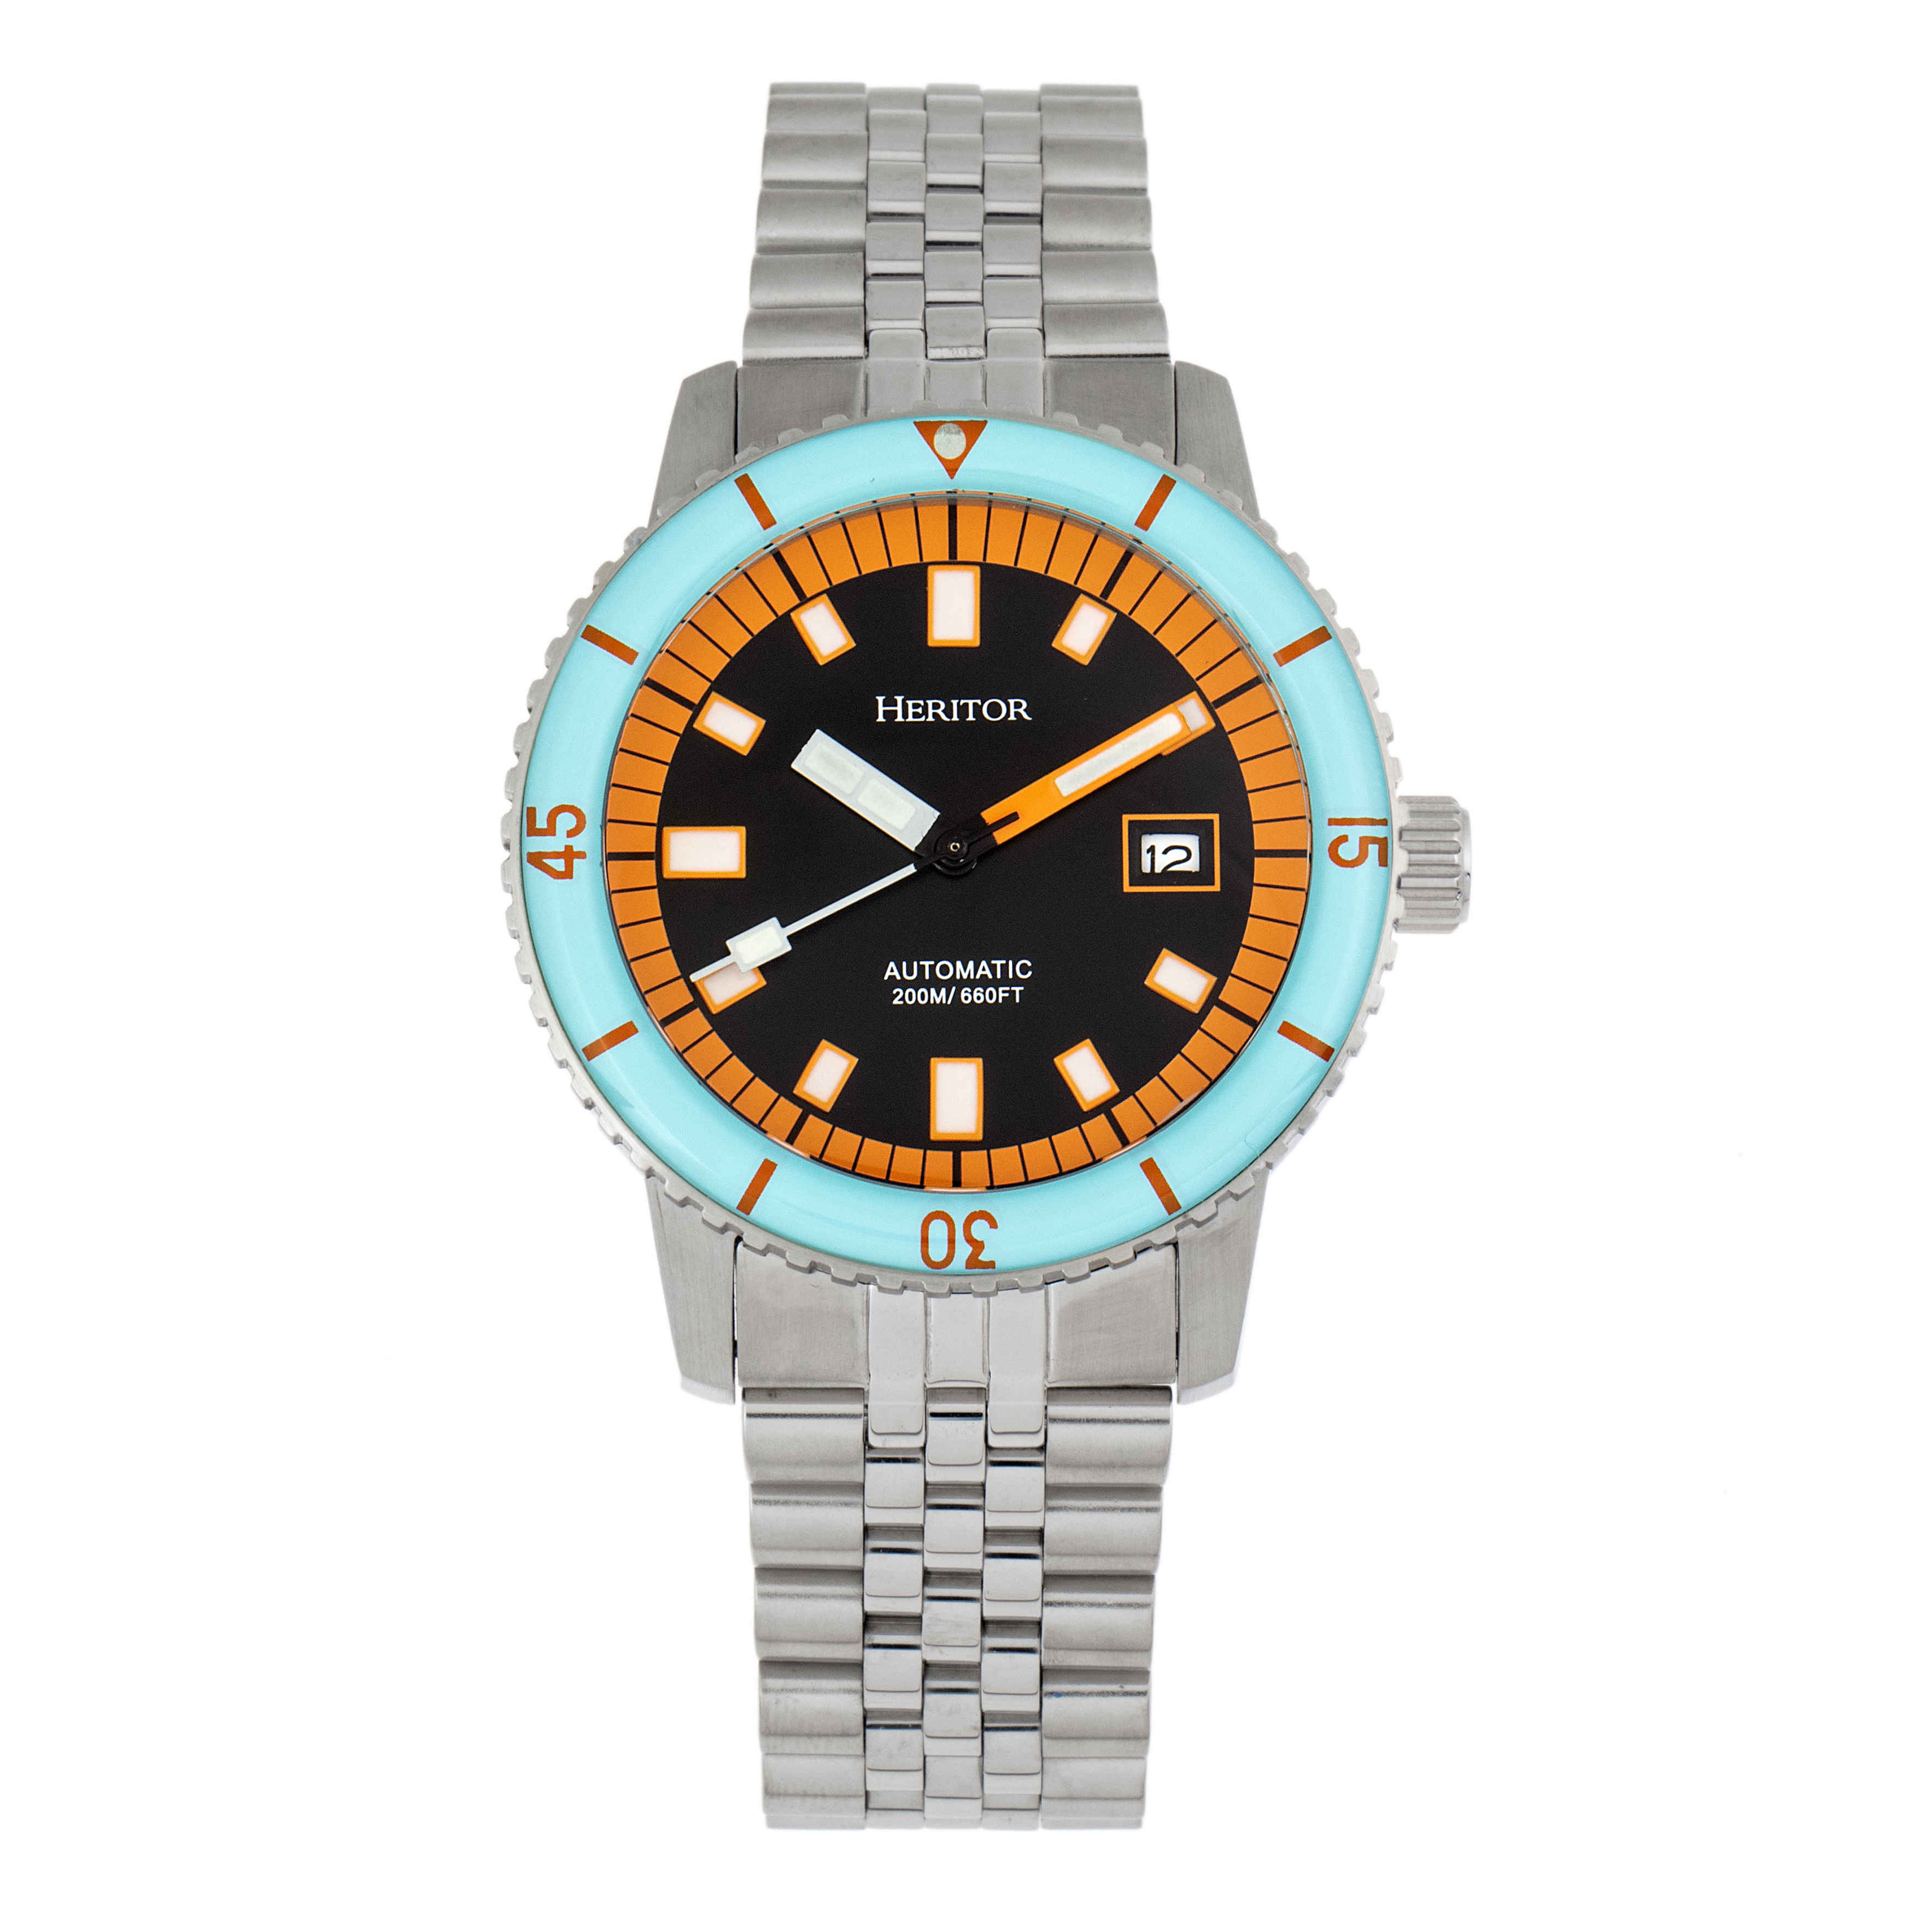 Heritor Edgard Automatic Black Dial Mens Watch Hr9102 In Black,blue,orange,silver Tone